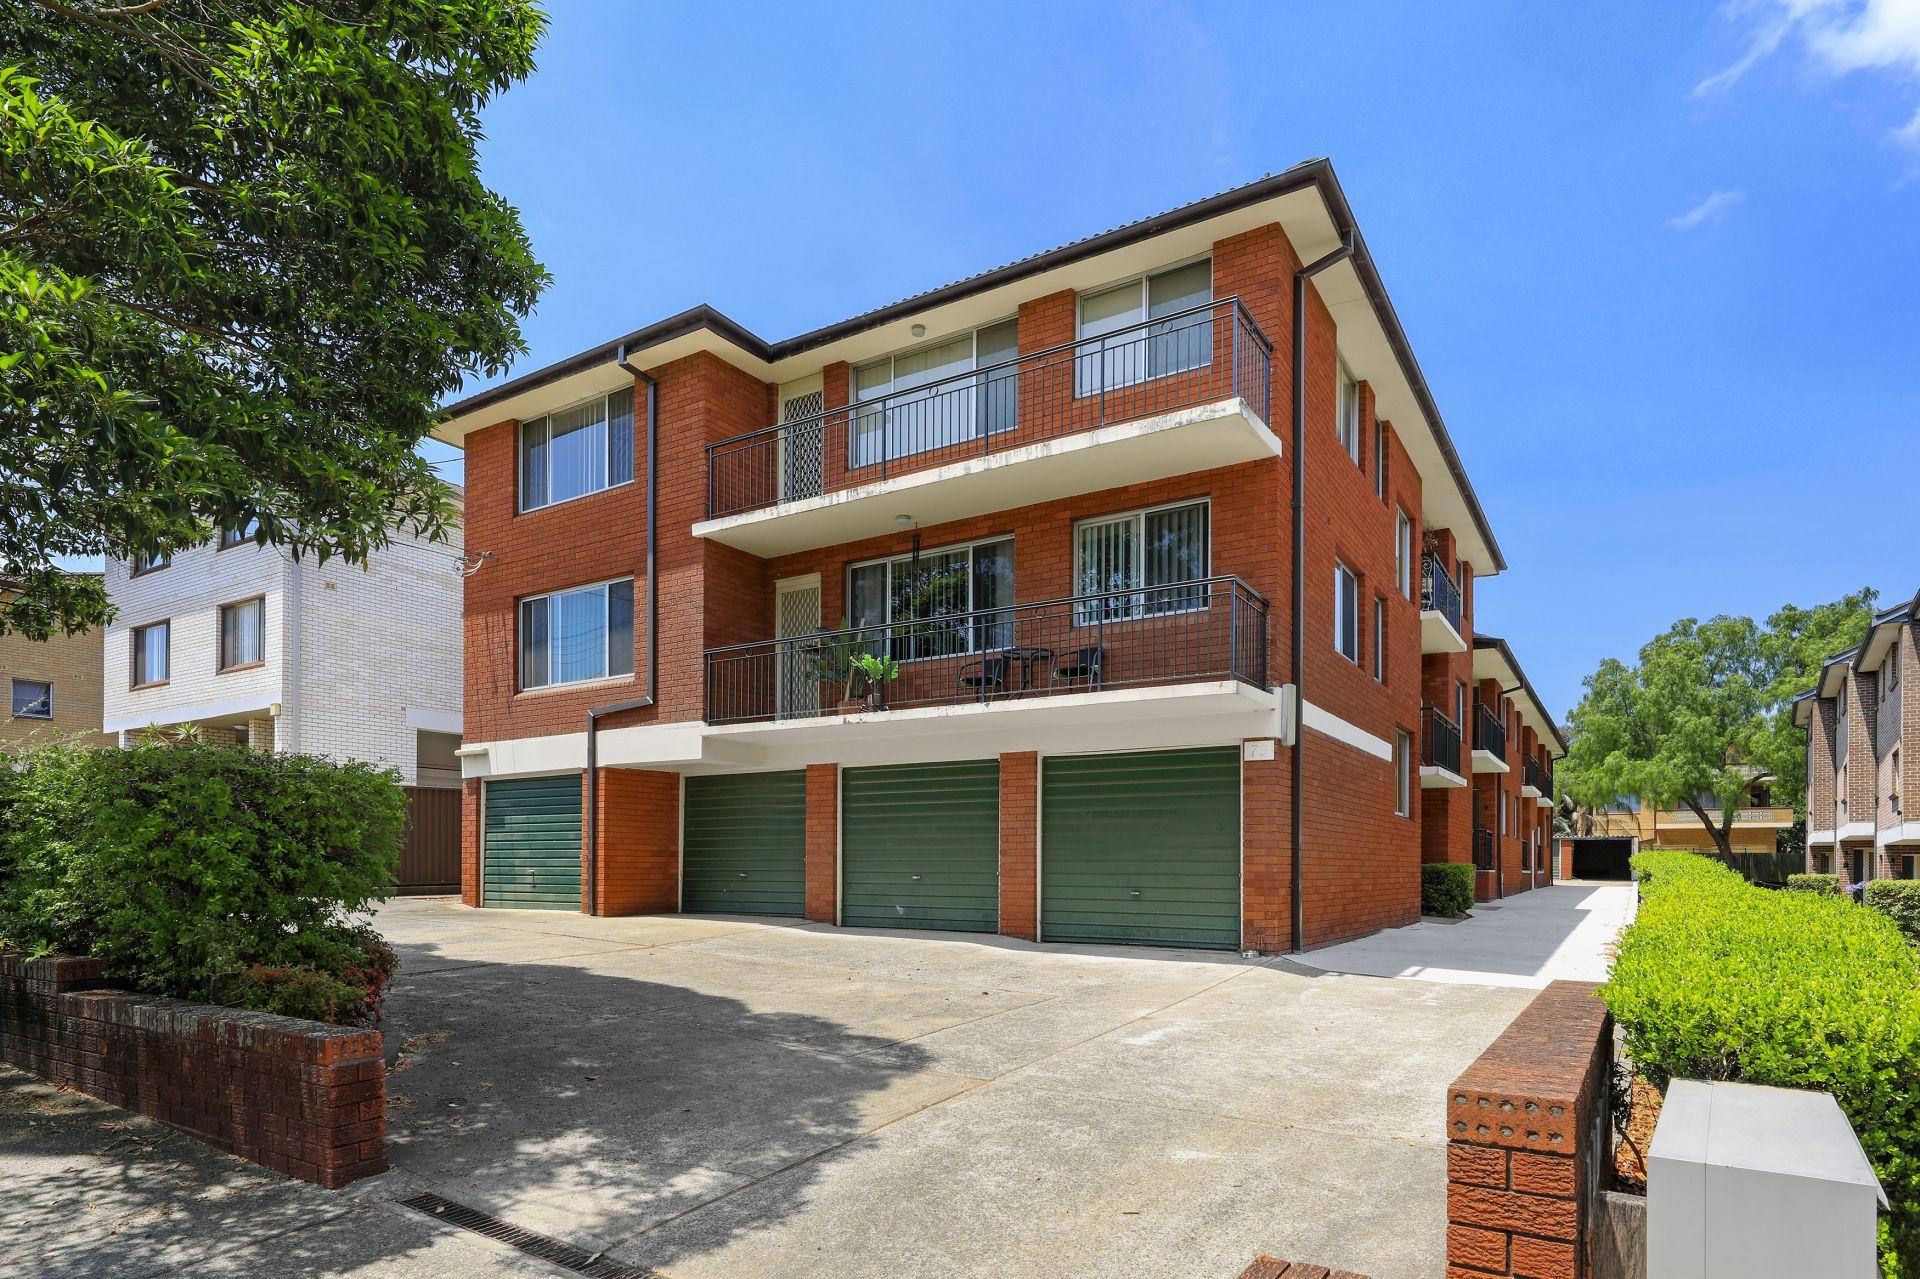 7/73 Garfield Street, Five Dock NSW